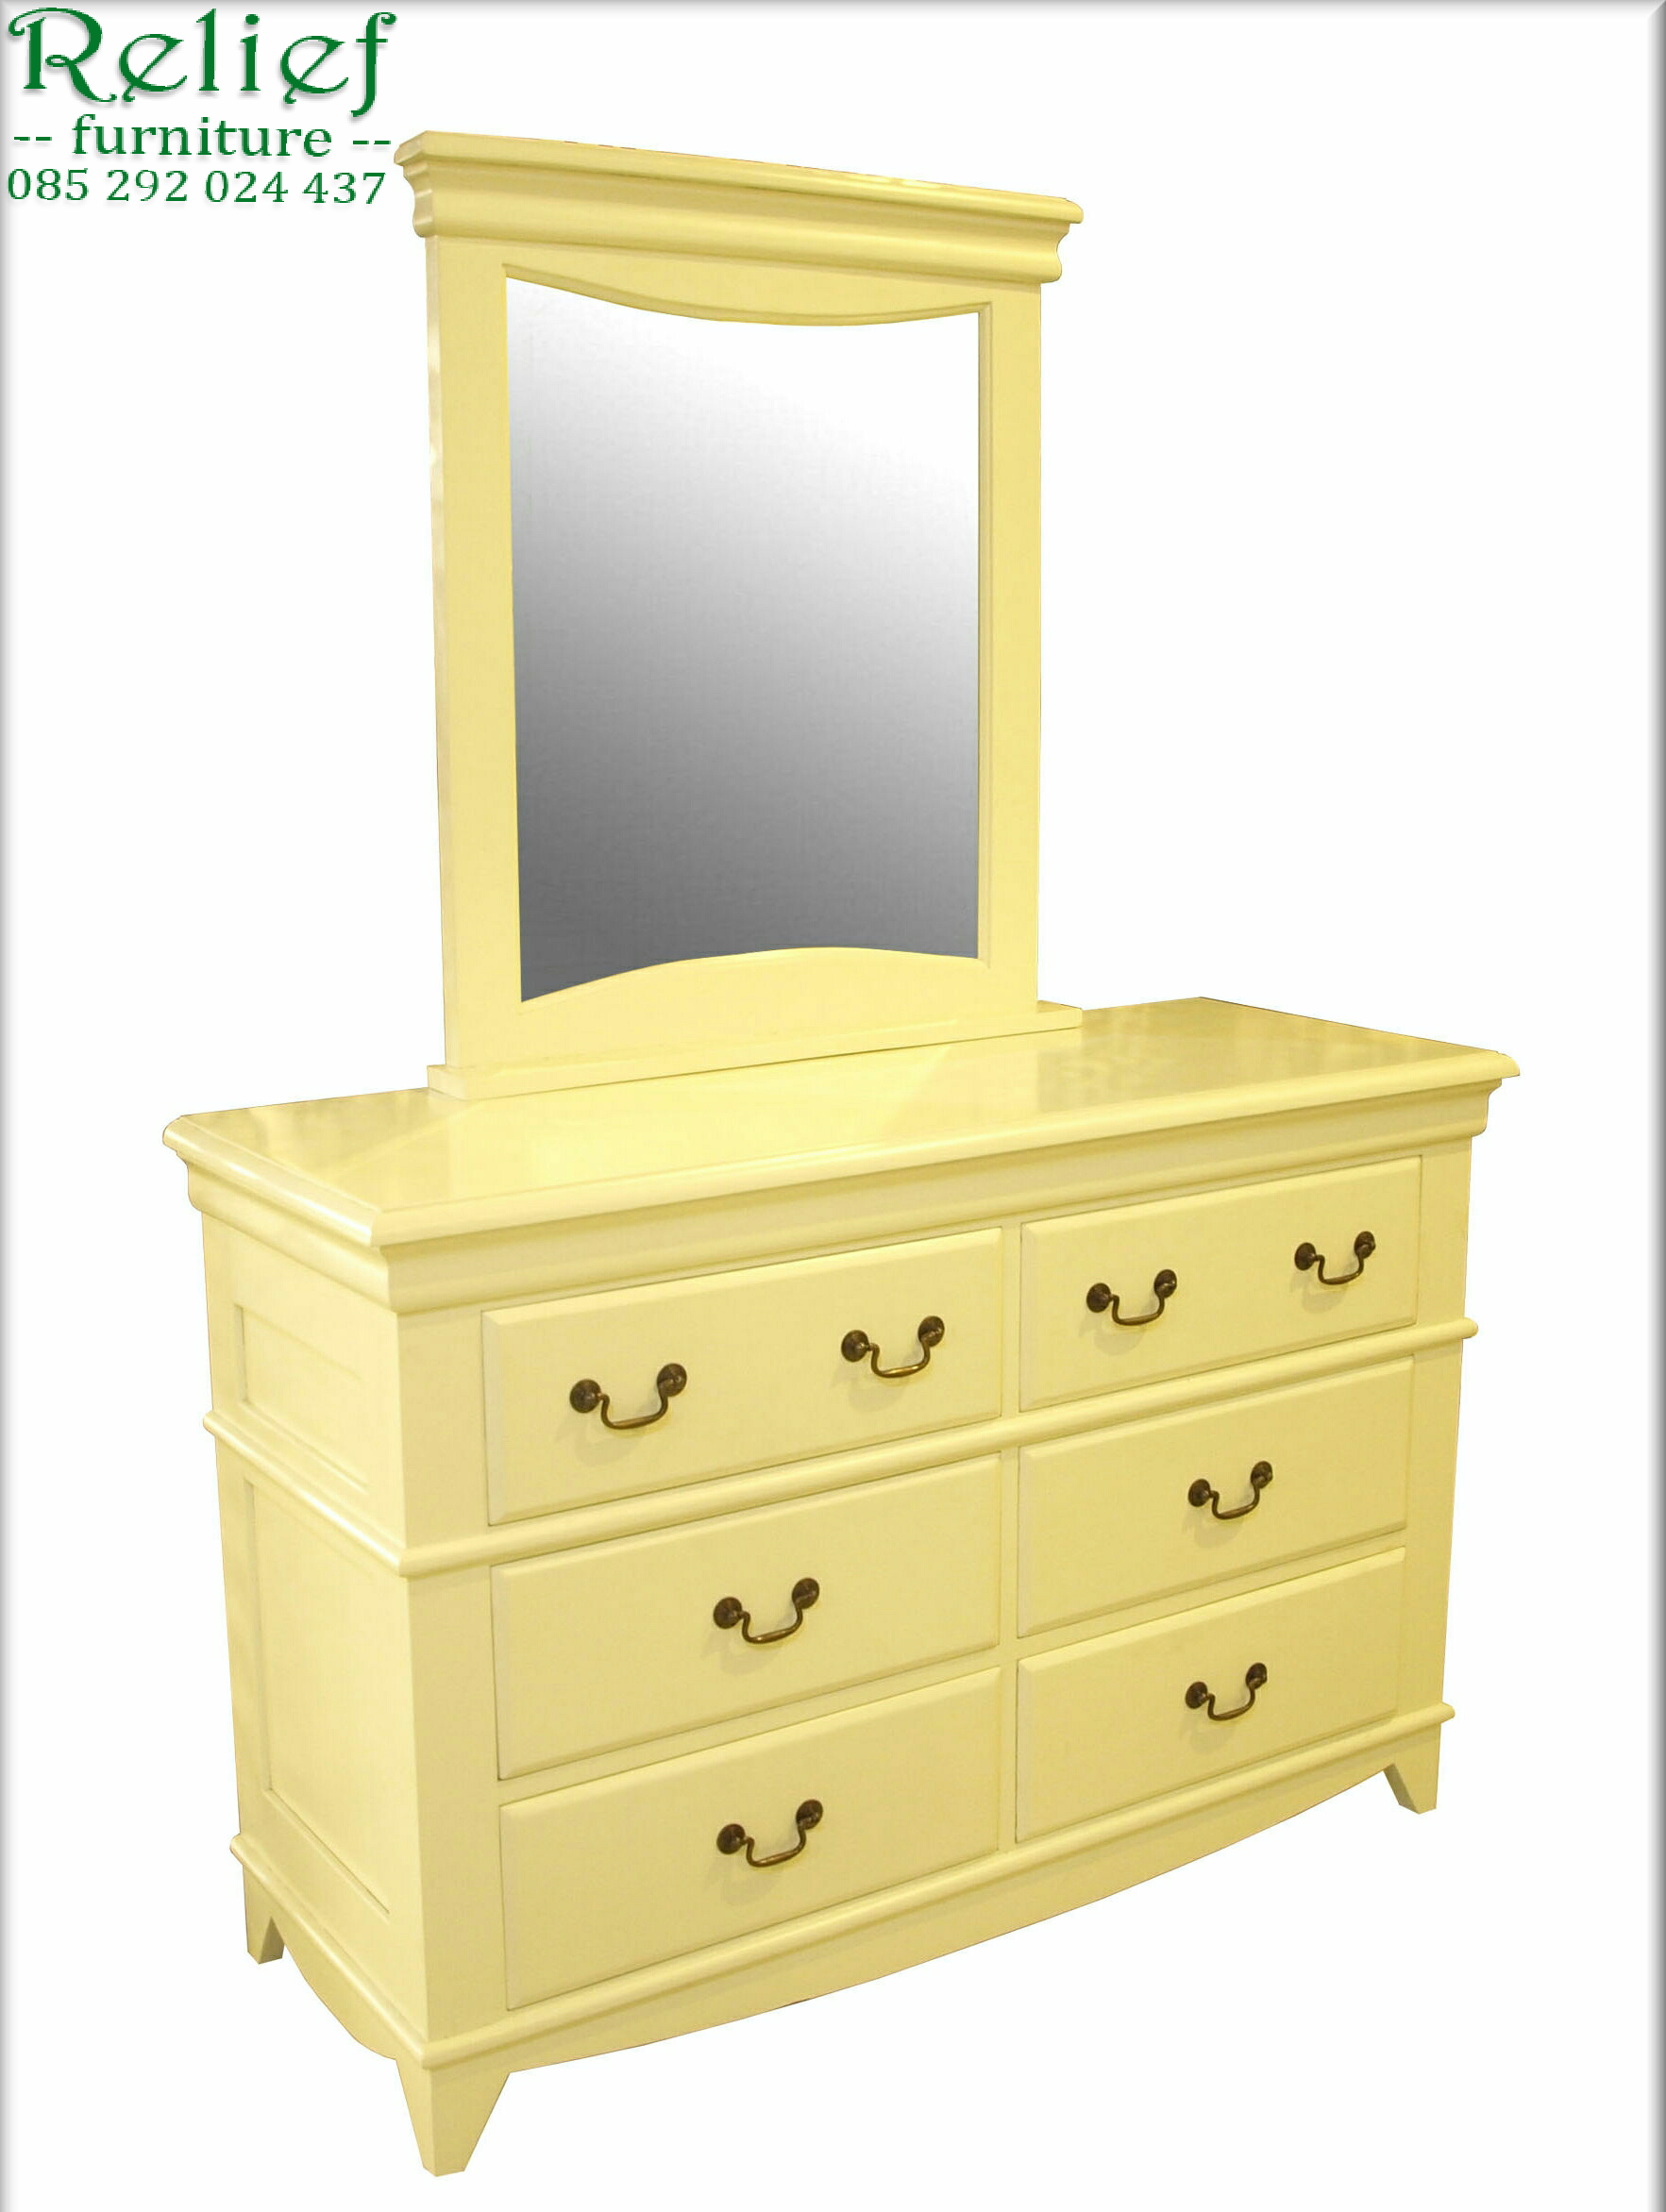 MEJA RIAS MINIMALIS MEWAH 4,Cermin hias mewah,cermin hias minimalis,cermin hias antic,cermin hias ukir,cermin hias modern,cermin hias terbaru,cermin hias besar,cermin hias kecil,cermin hias istimewa,cermin hias keluarga,cermin rias mewah,cermin rias minimalis,cermin rias ukir,cermin rias modern,cermin rias terbaru,cermin rias besar,cermin rias kecil,cermin rias istimewa,cermin rias istimewa,cermin rias eksport,meja konsule,meja console